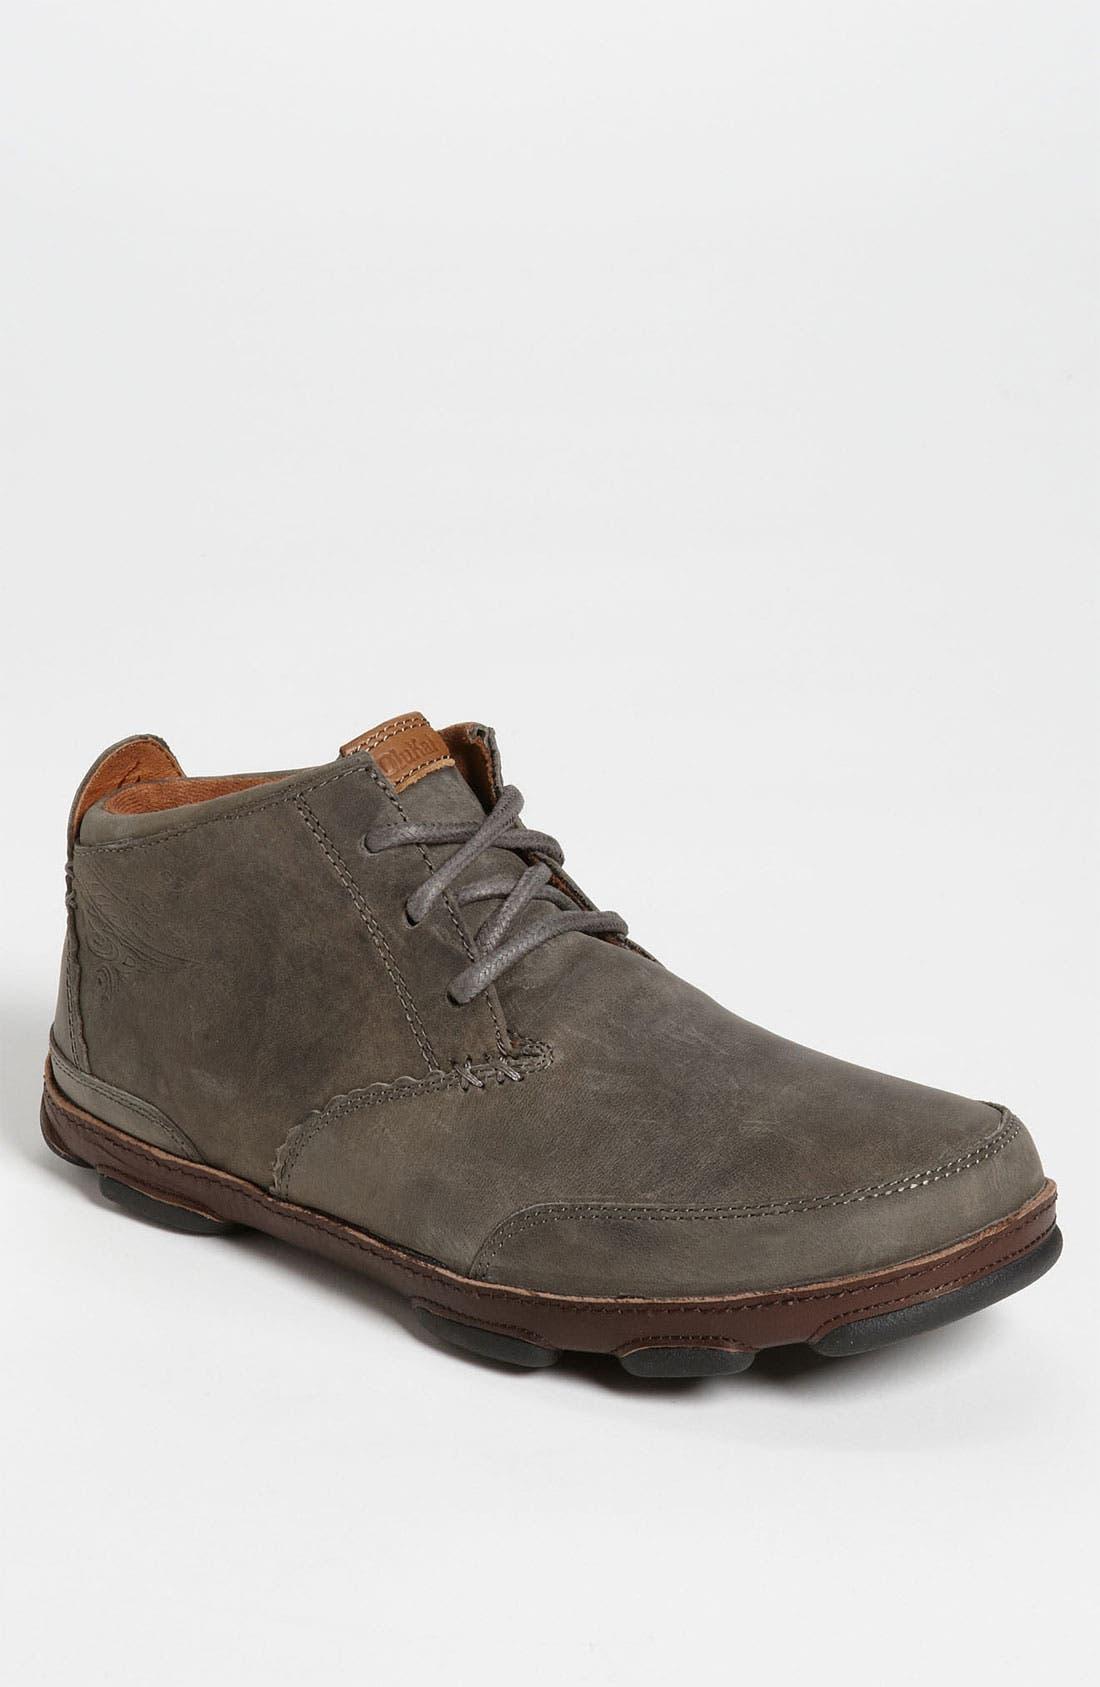 Alternate Image 1 Selected - OluKai 'Kamuela' Ankle Boot (Men)